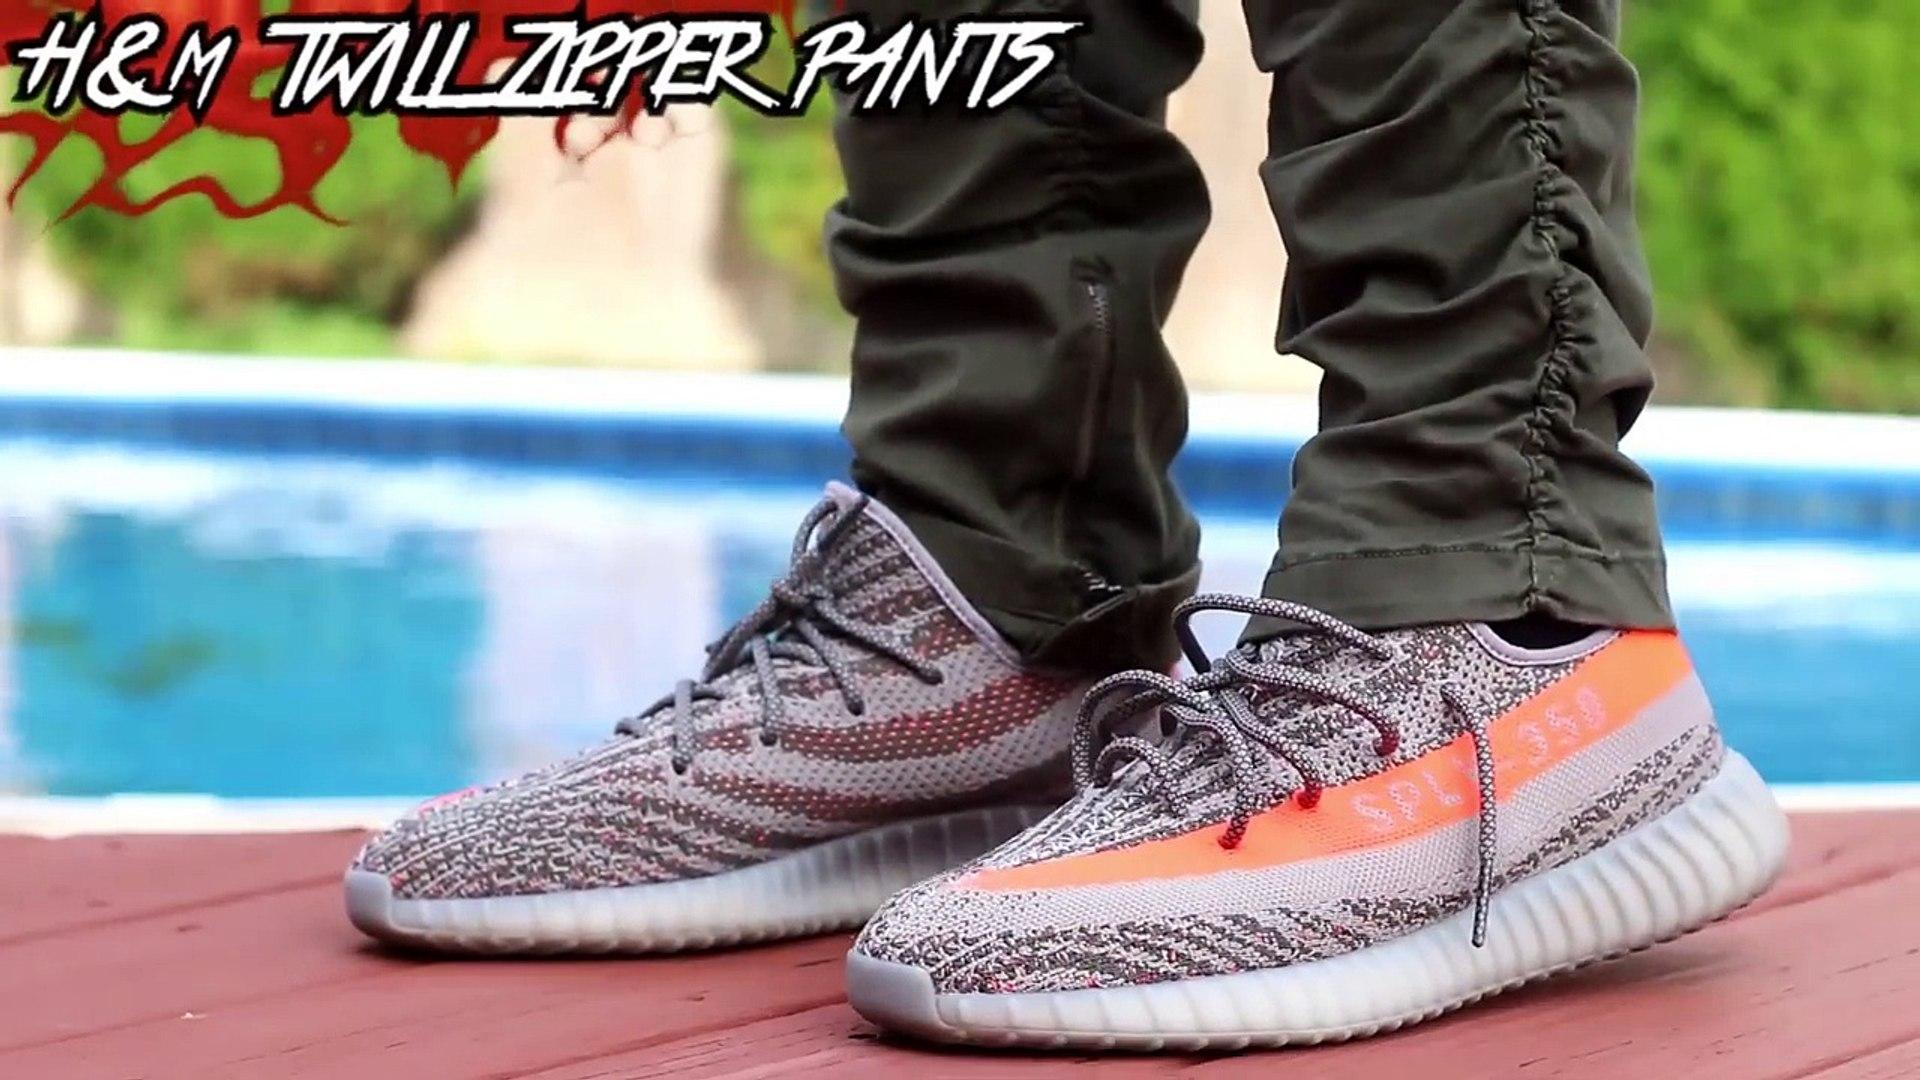 Yeezy V2 Beluga On Feet Comparison Video Dailymotion